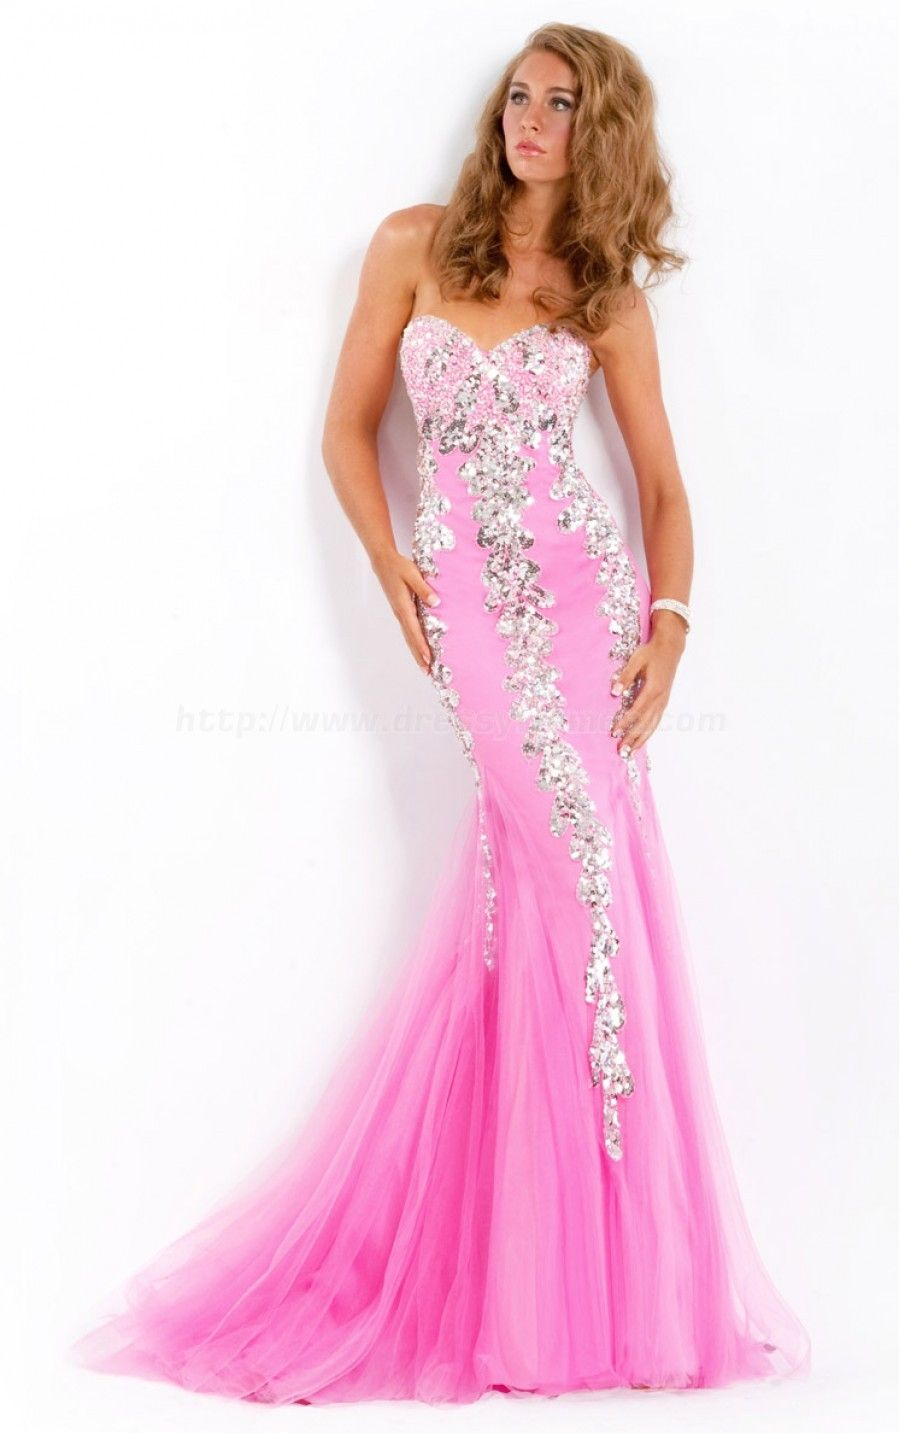 Glamorous style organze prom dresses prom dress prom dresses dress